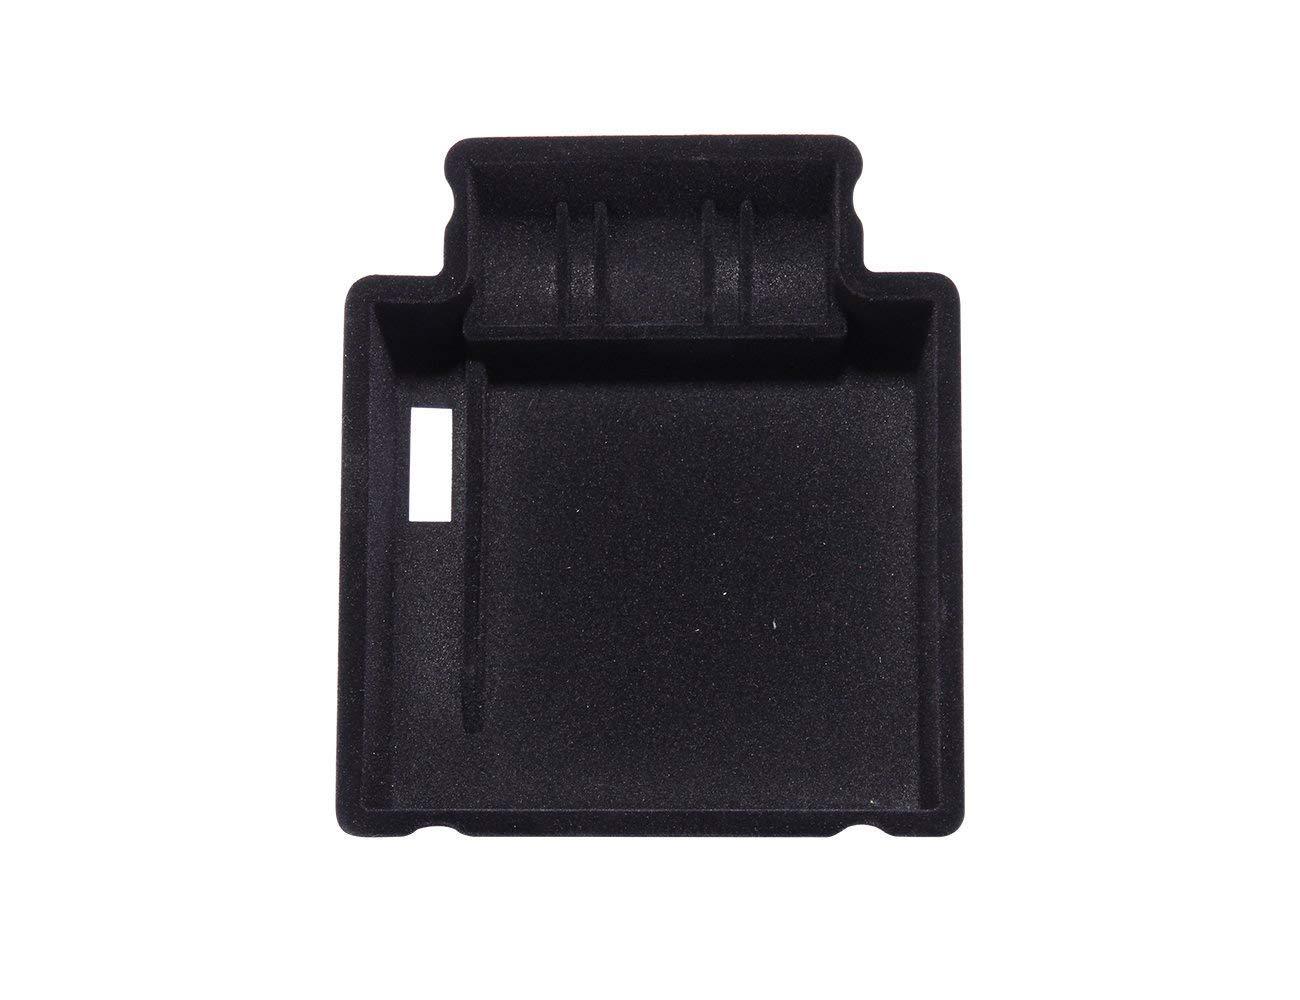 Plastic Armrest Storage Box Phone Glove Tray holder for Porsche Macan 2014-2017 plastic